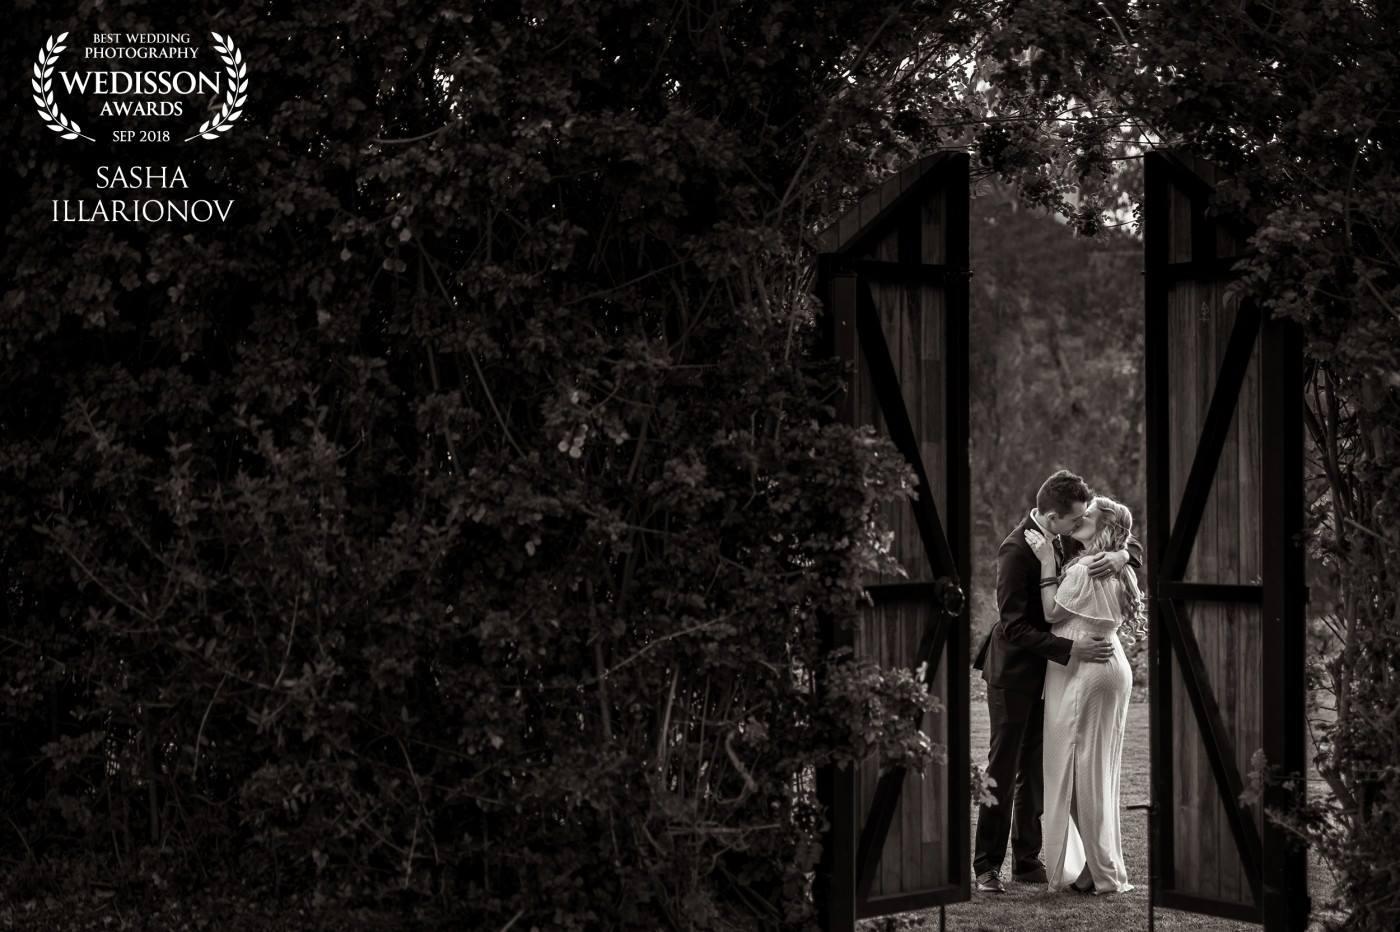 adelaide wedding photography award 01.jpg